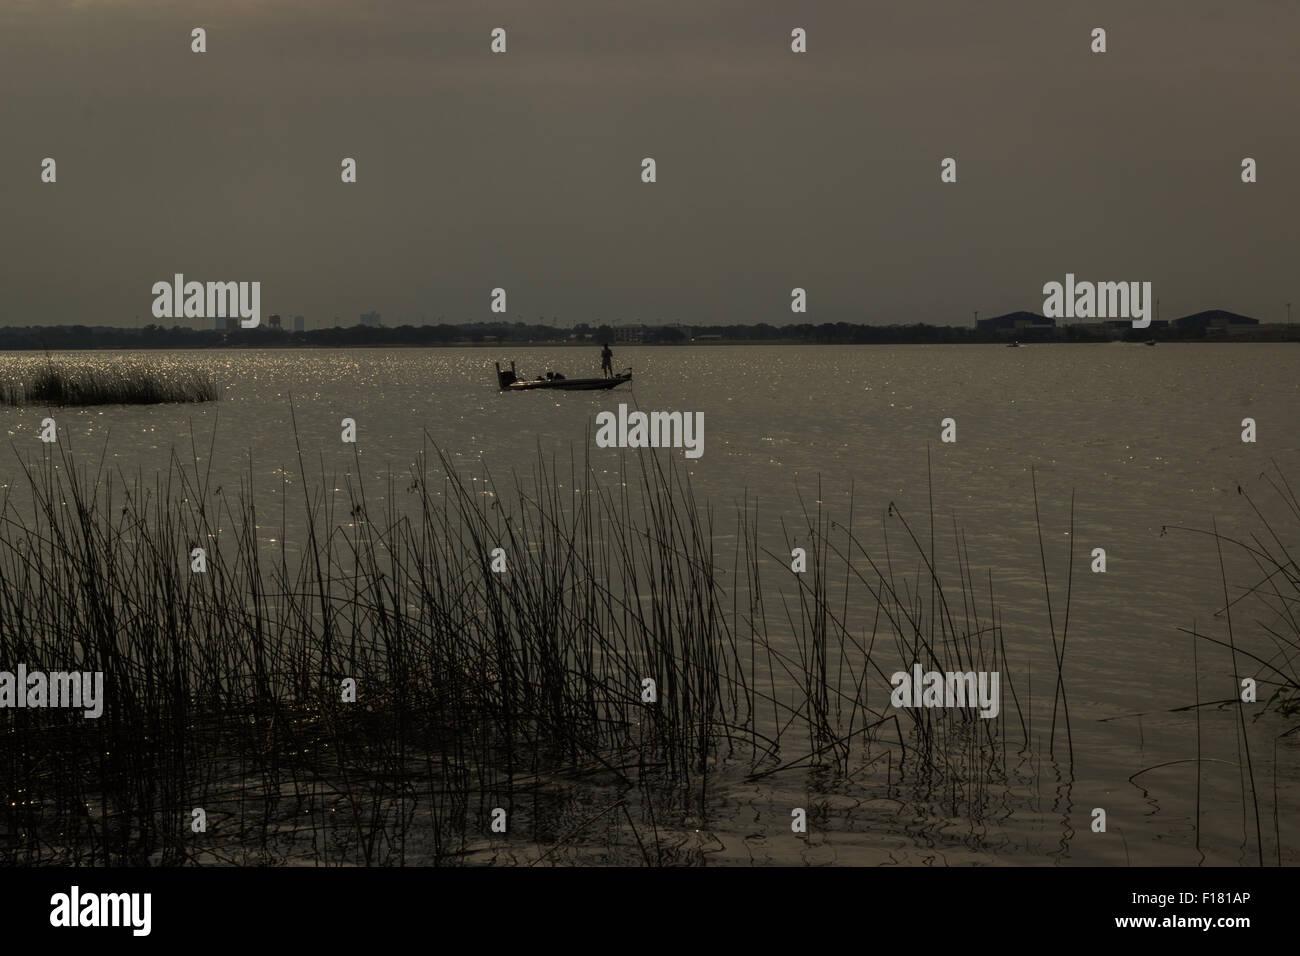 Silhouette Mann auf Boot am See Stockfoto